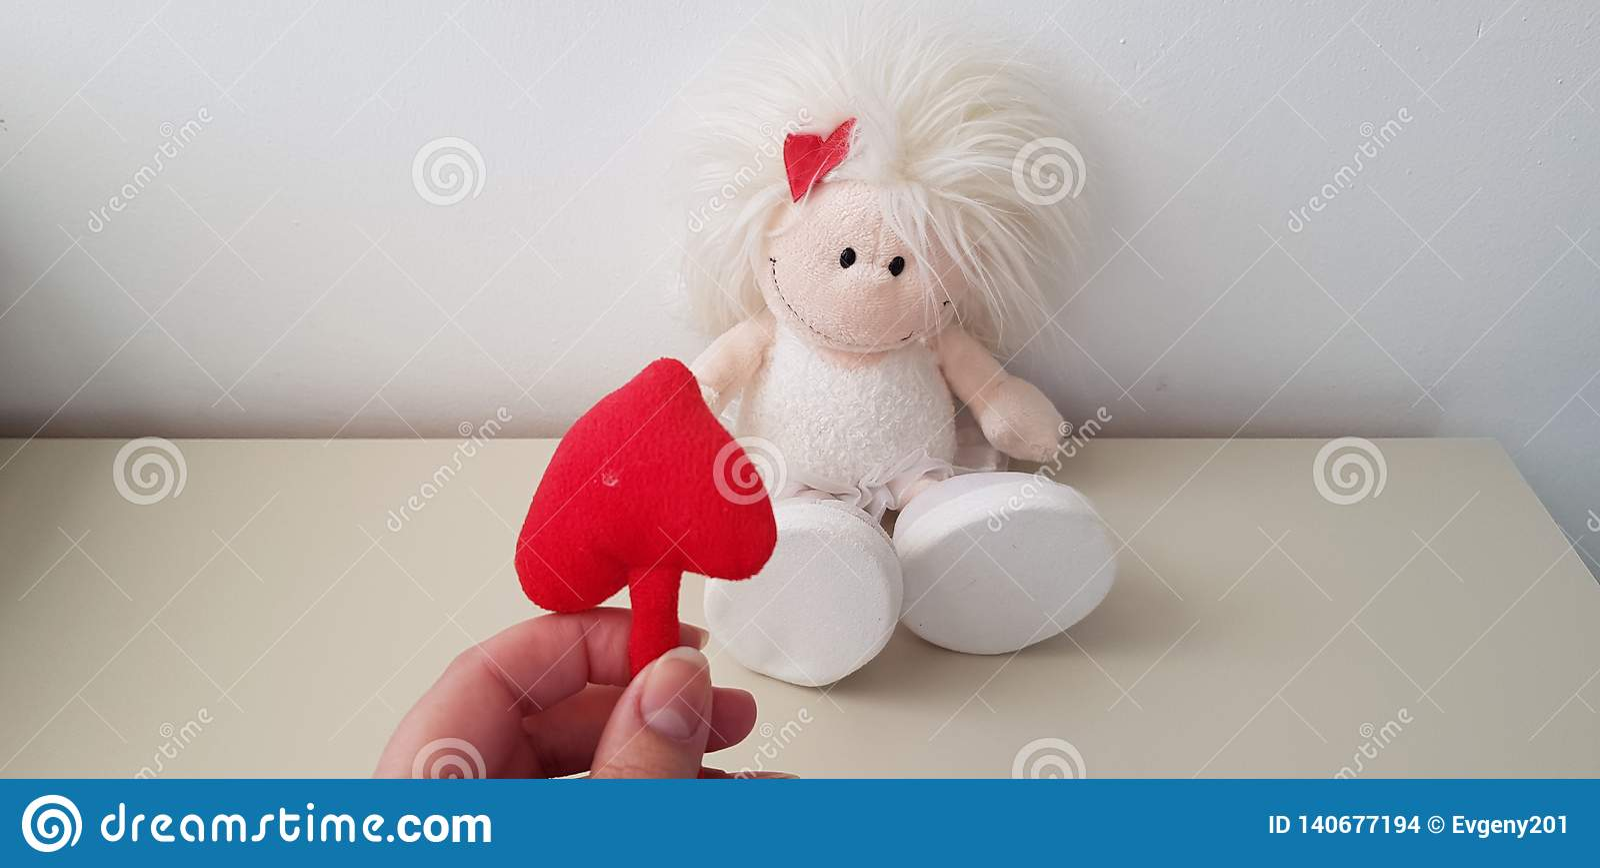 Red soft heart shape in female fingers